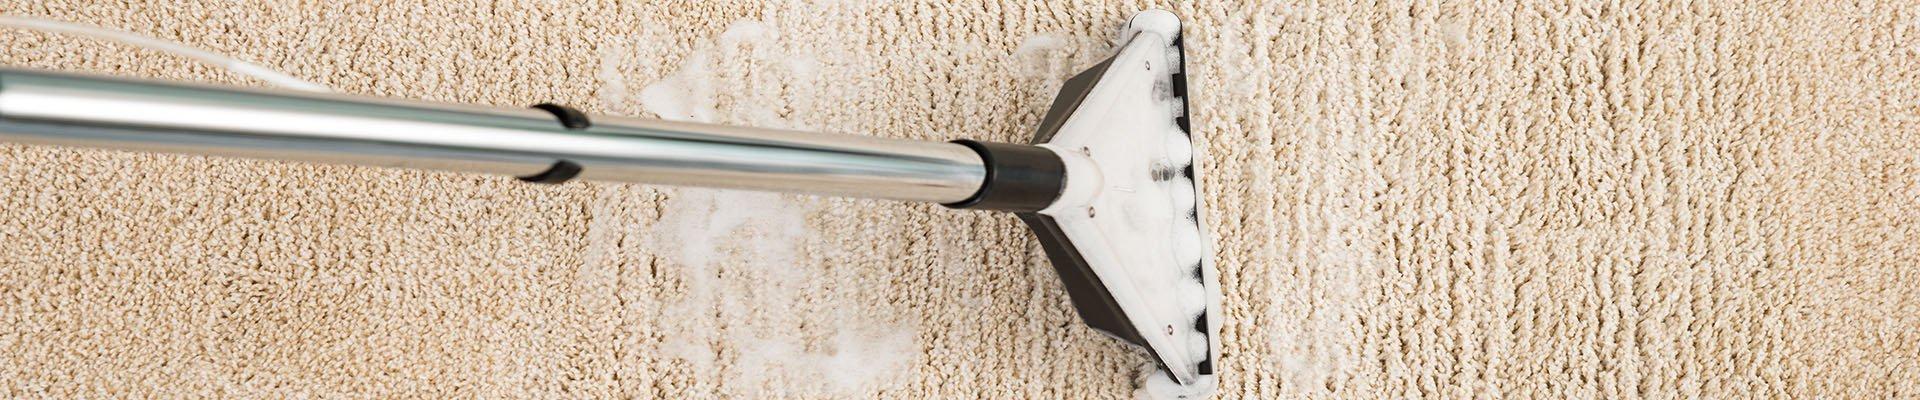 Carpet Cleaning Slider